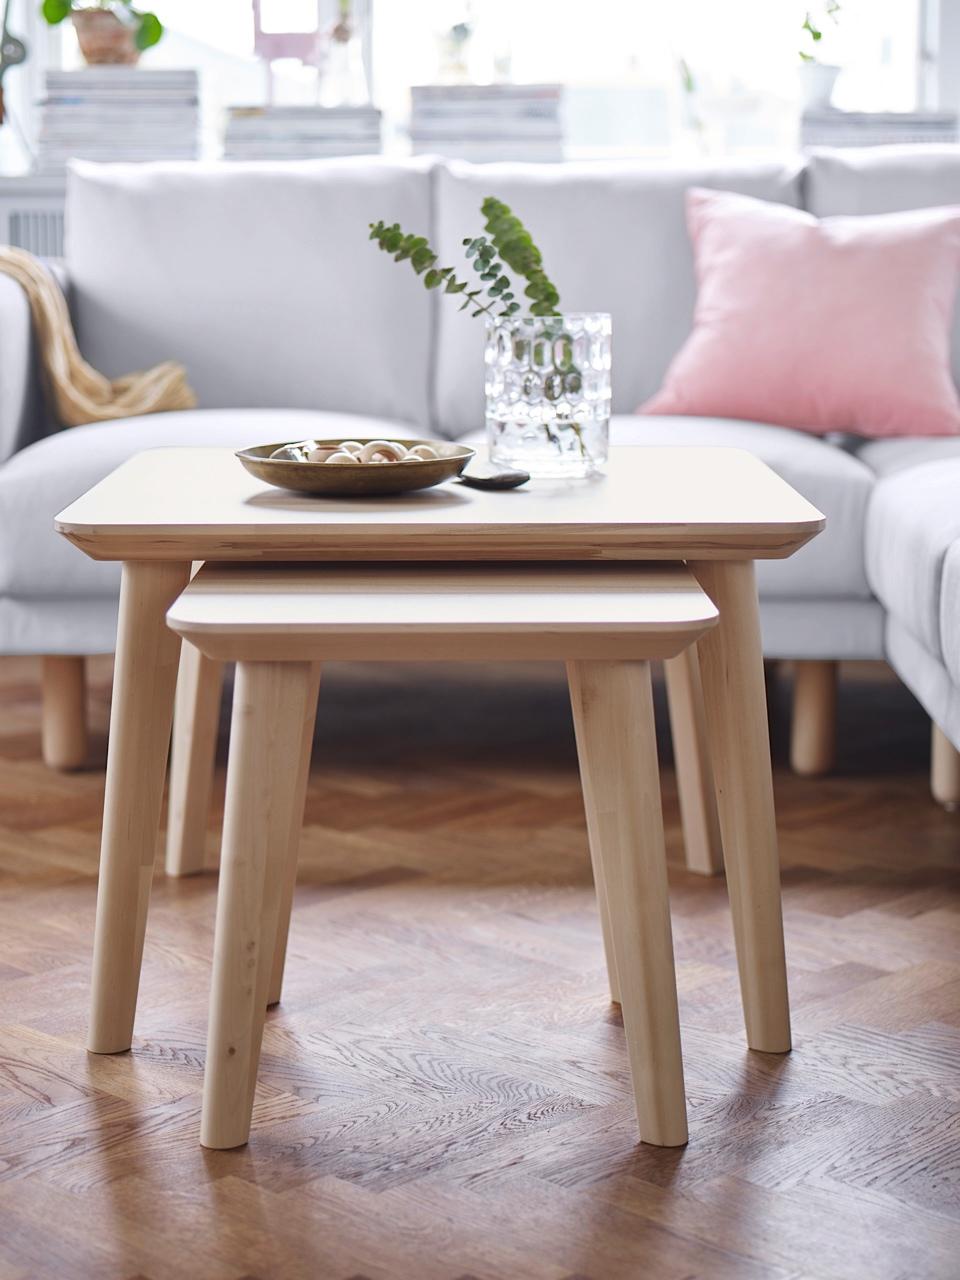 inredningshj lpen ikea lisabo norsborg nyheter i h st. Black Bedroom Furniture Sets. Home Design Ideas